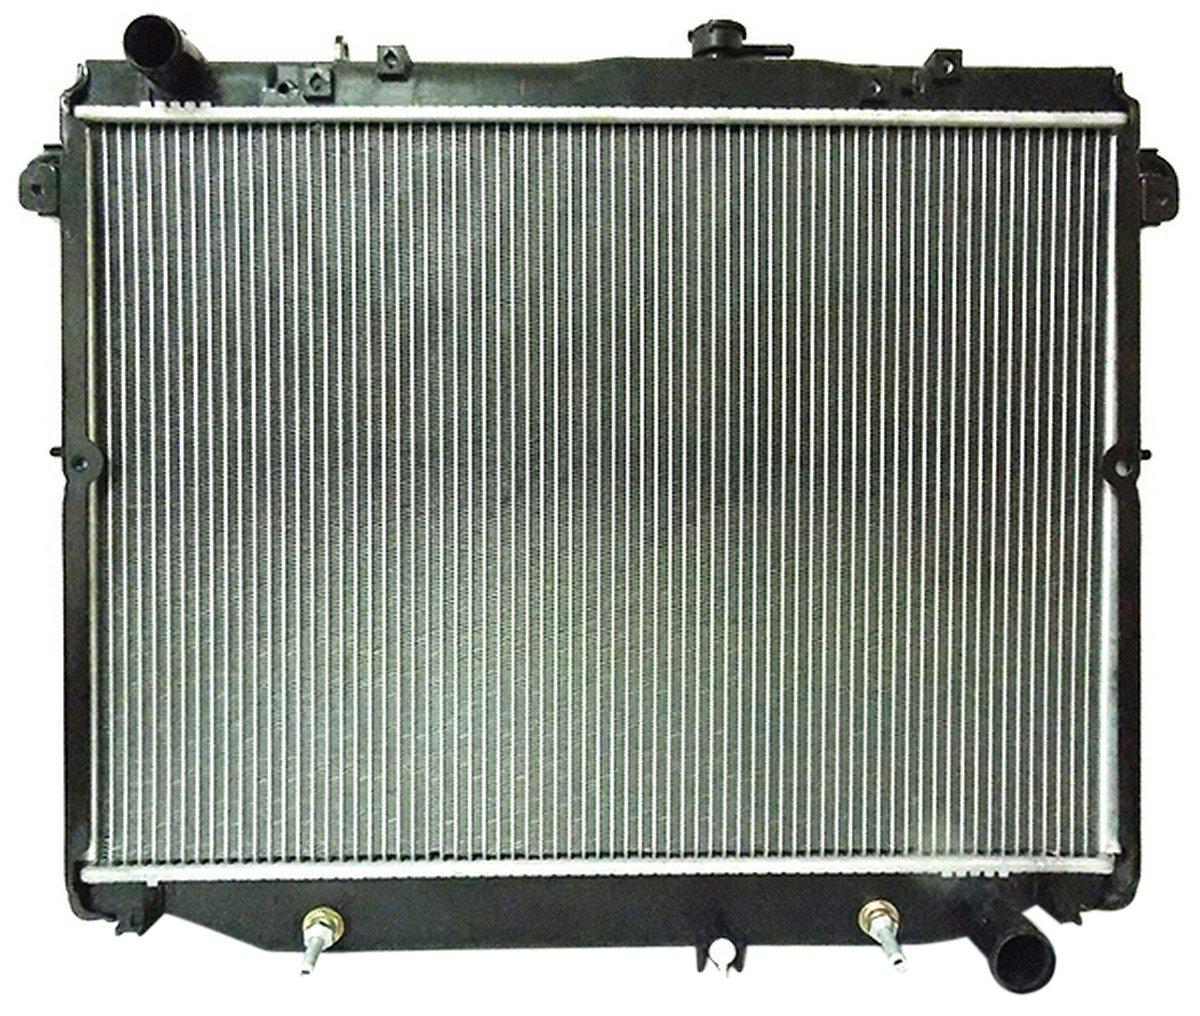 CSF 3006 Radiator by CSF